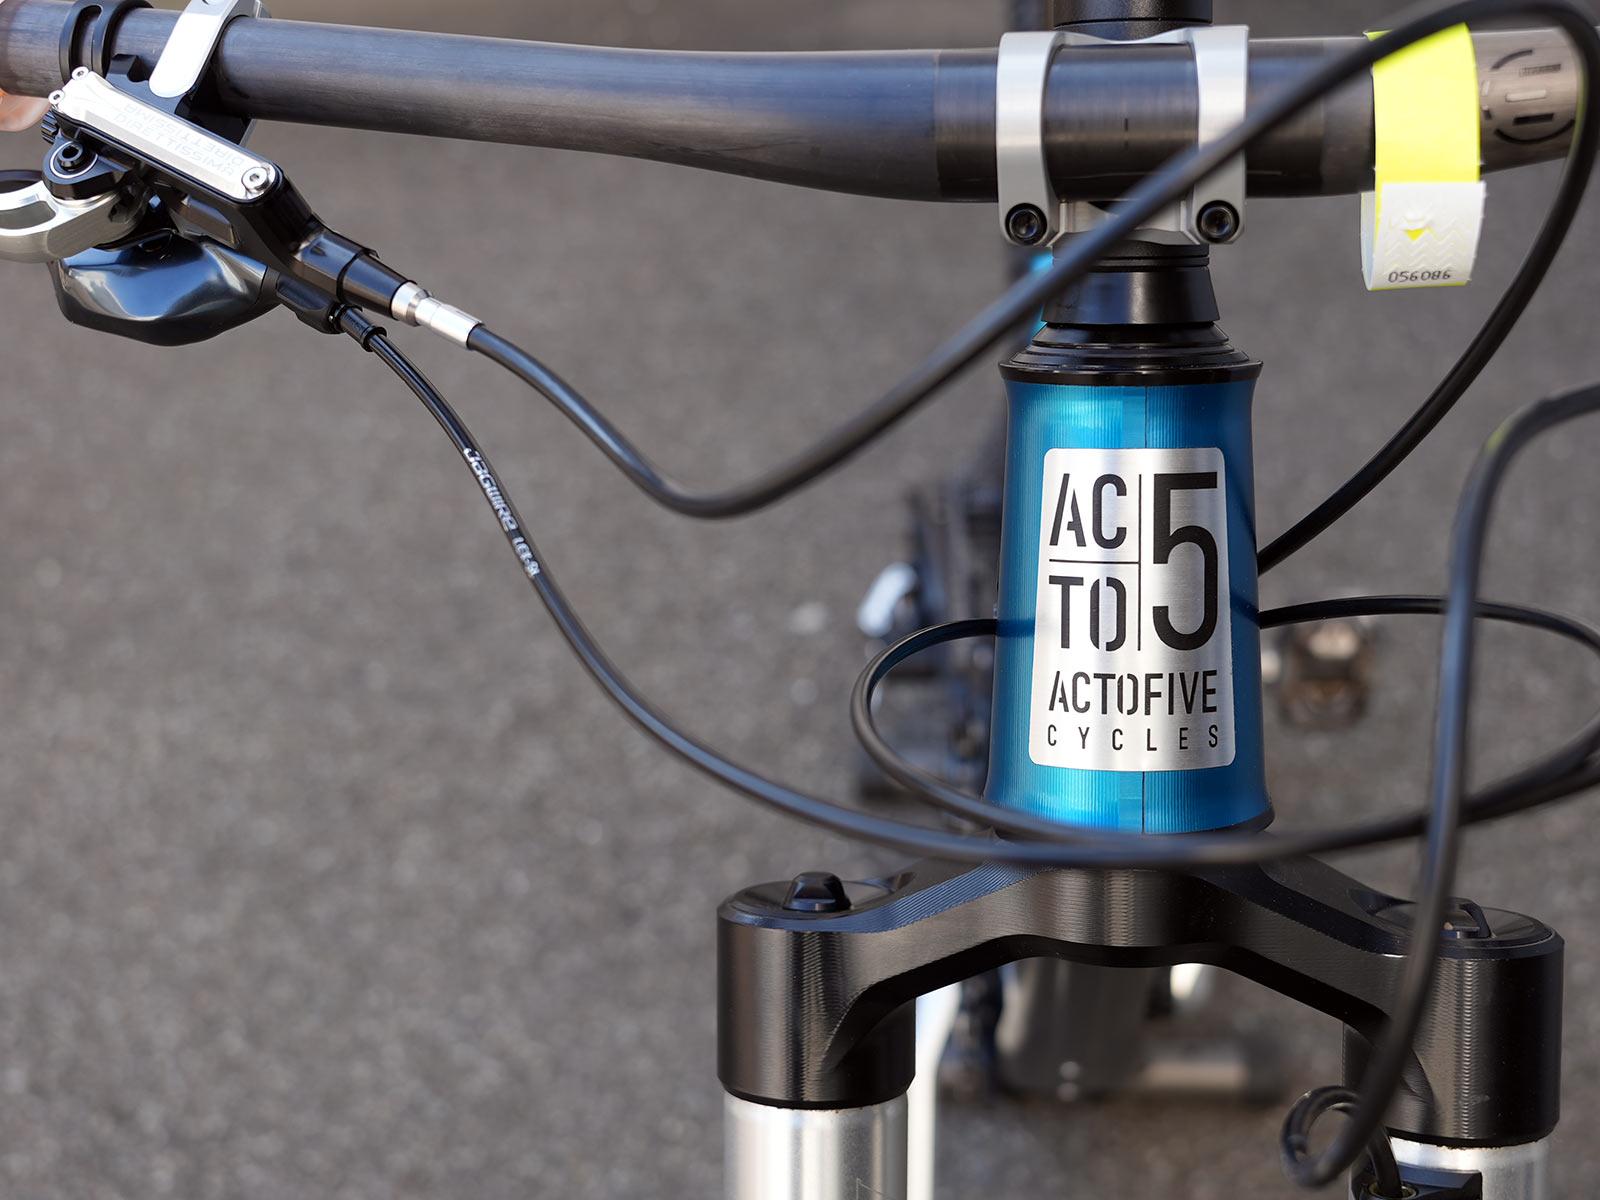 actofive enduro mountain bike with high pivot